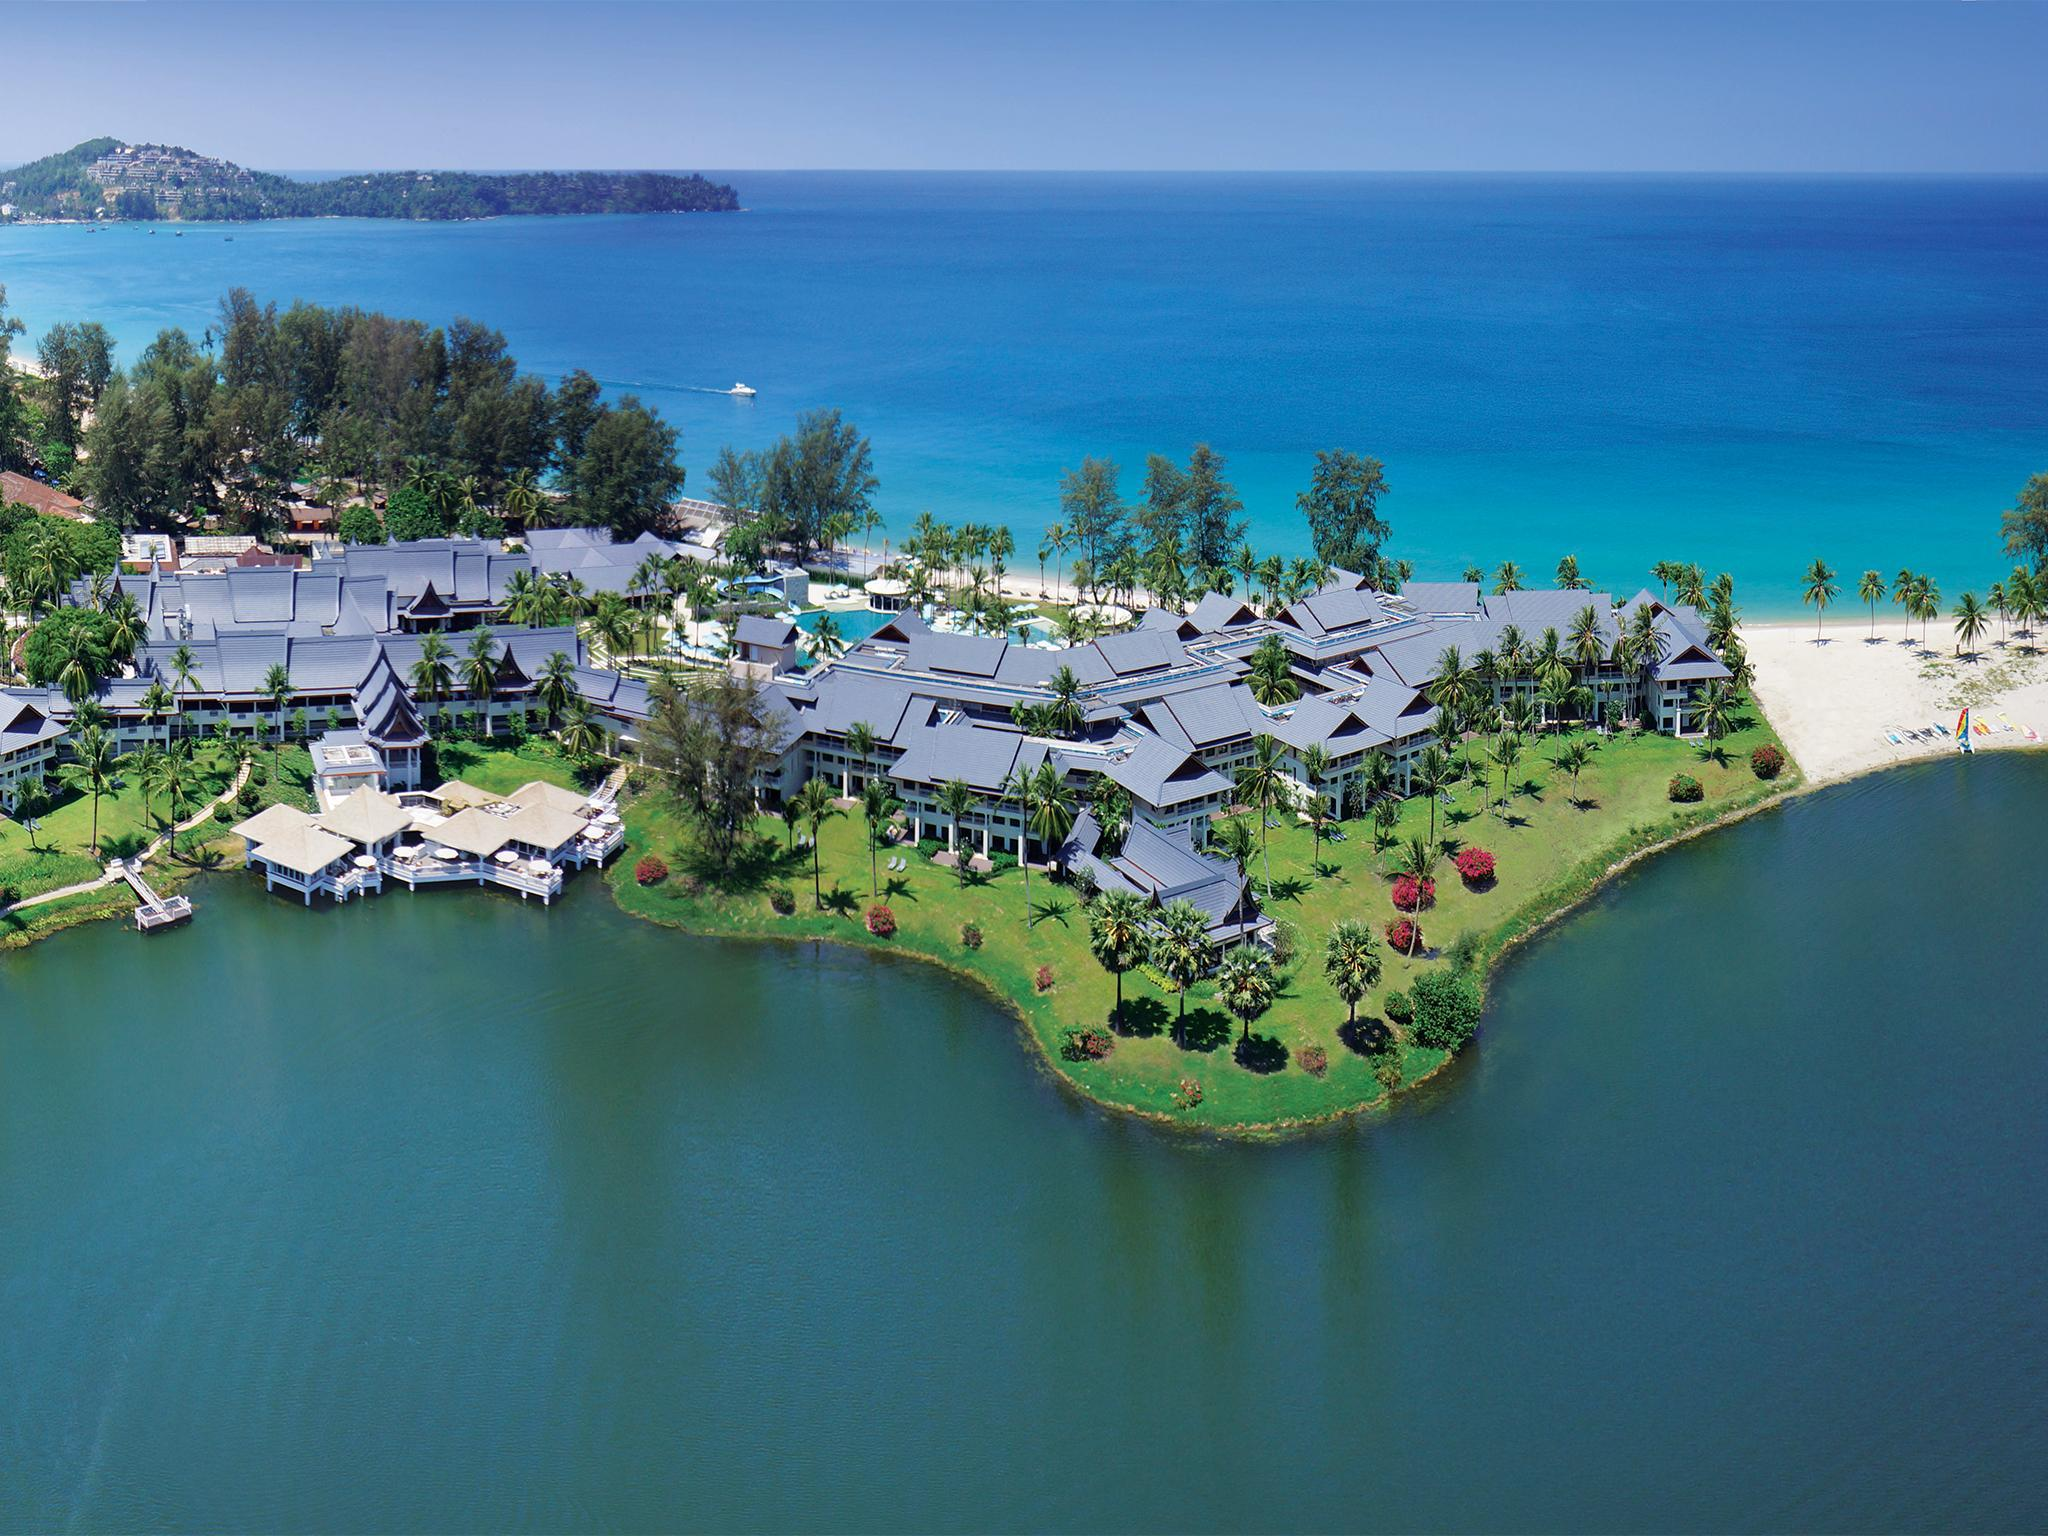 Outrigger Laguna Phuket Beach Resort เอาท์ริกเกอร์ ลากูน่า ภูเก็ตบีช รีสอร์ท